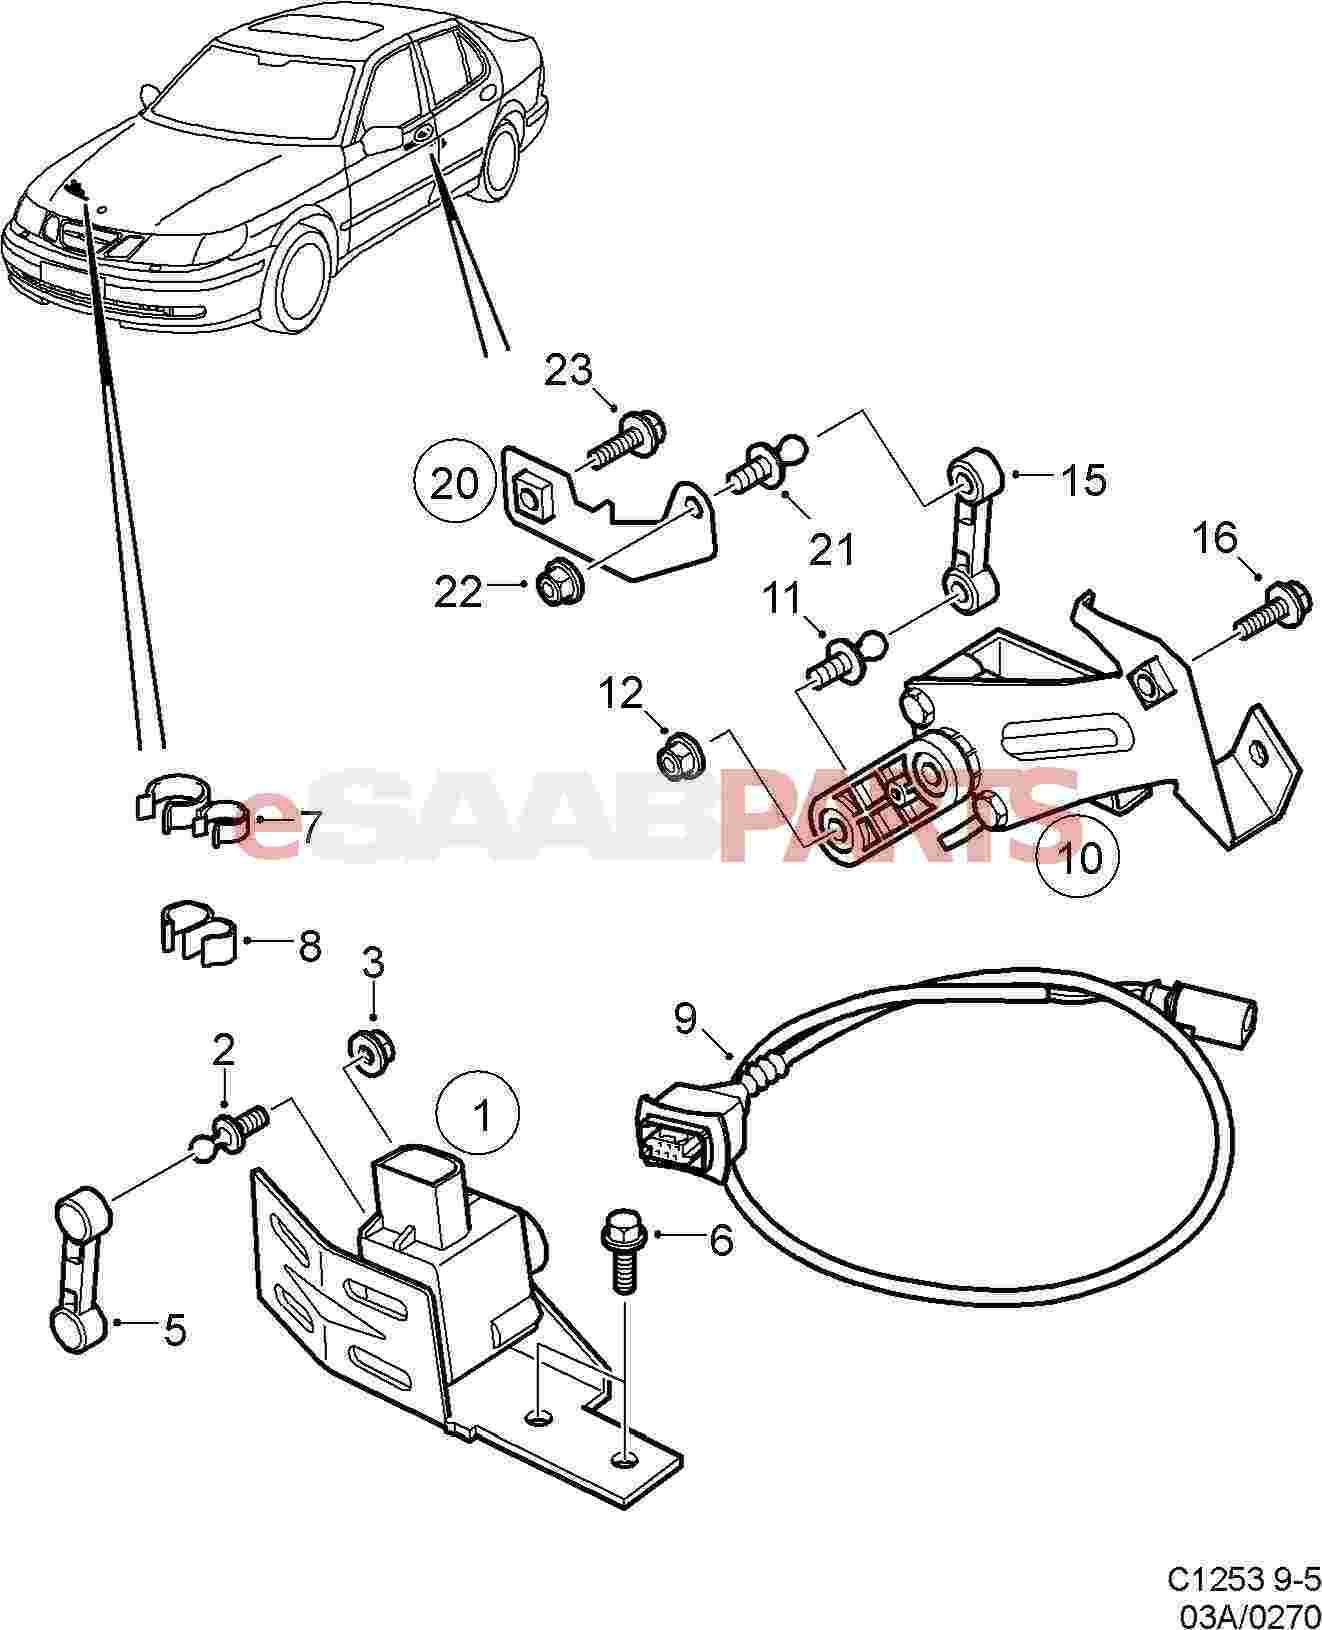 12783353  saab headlight leveling sensor - front  2002-2009